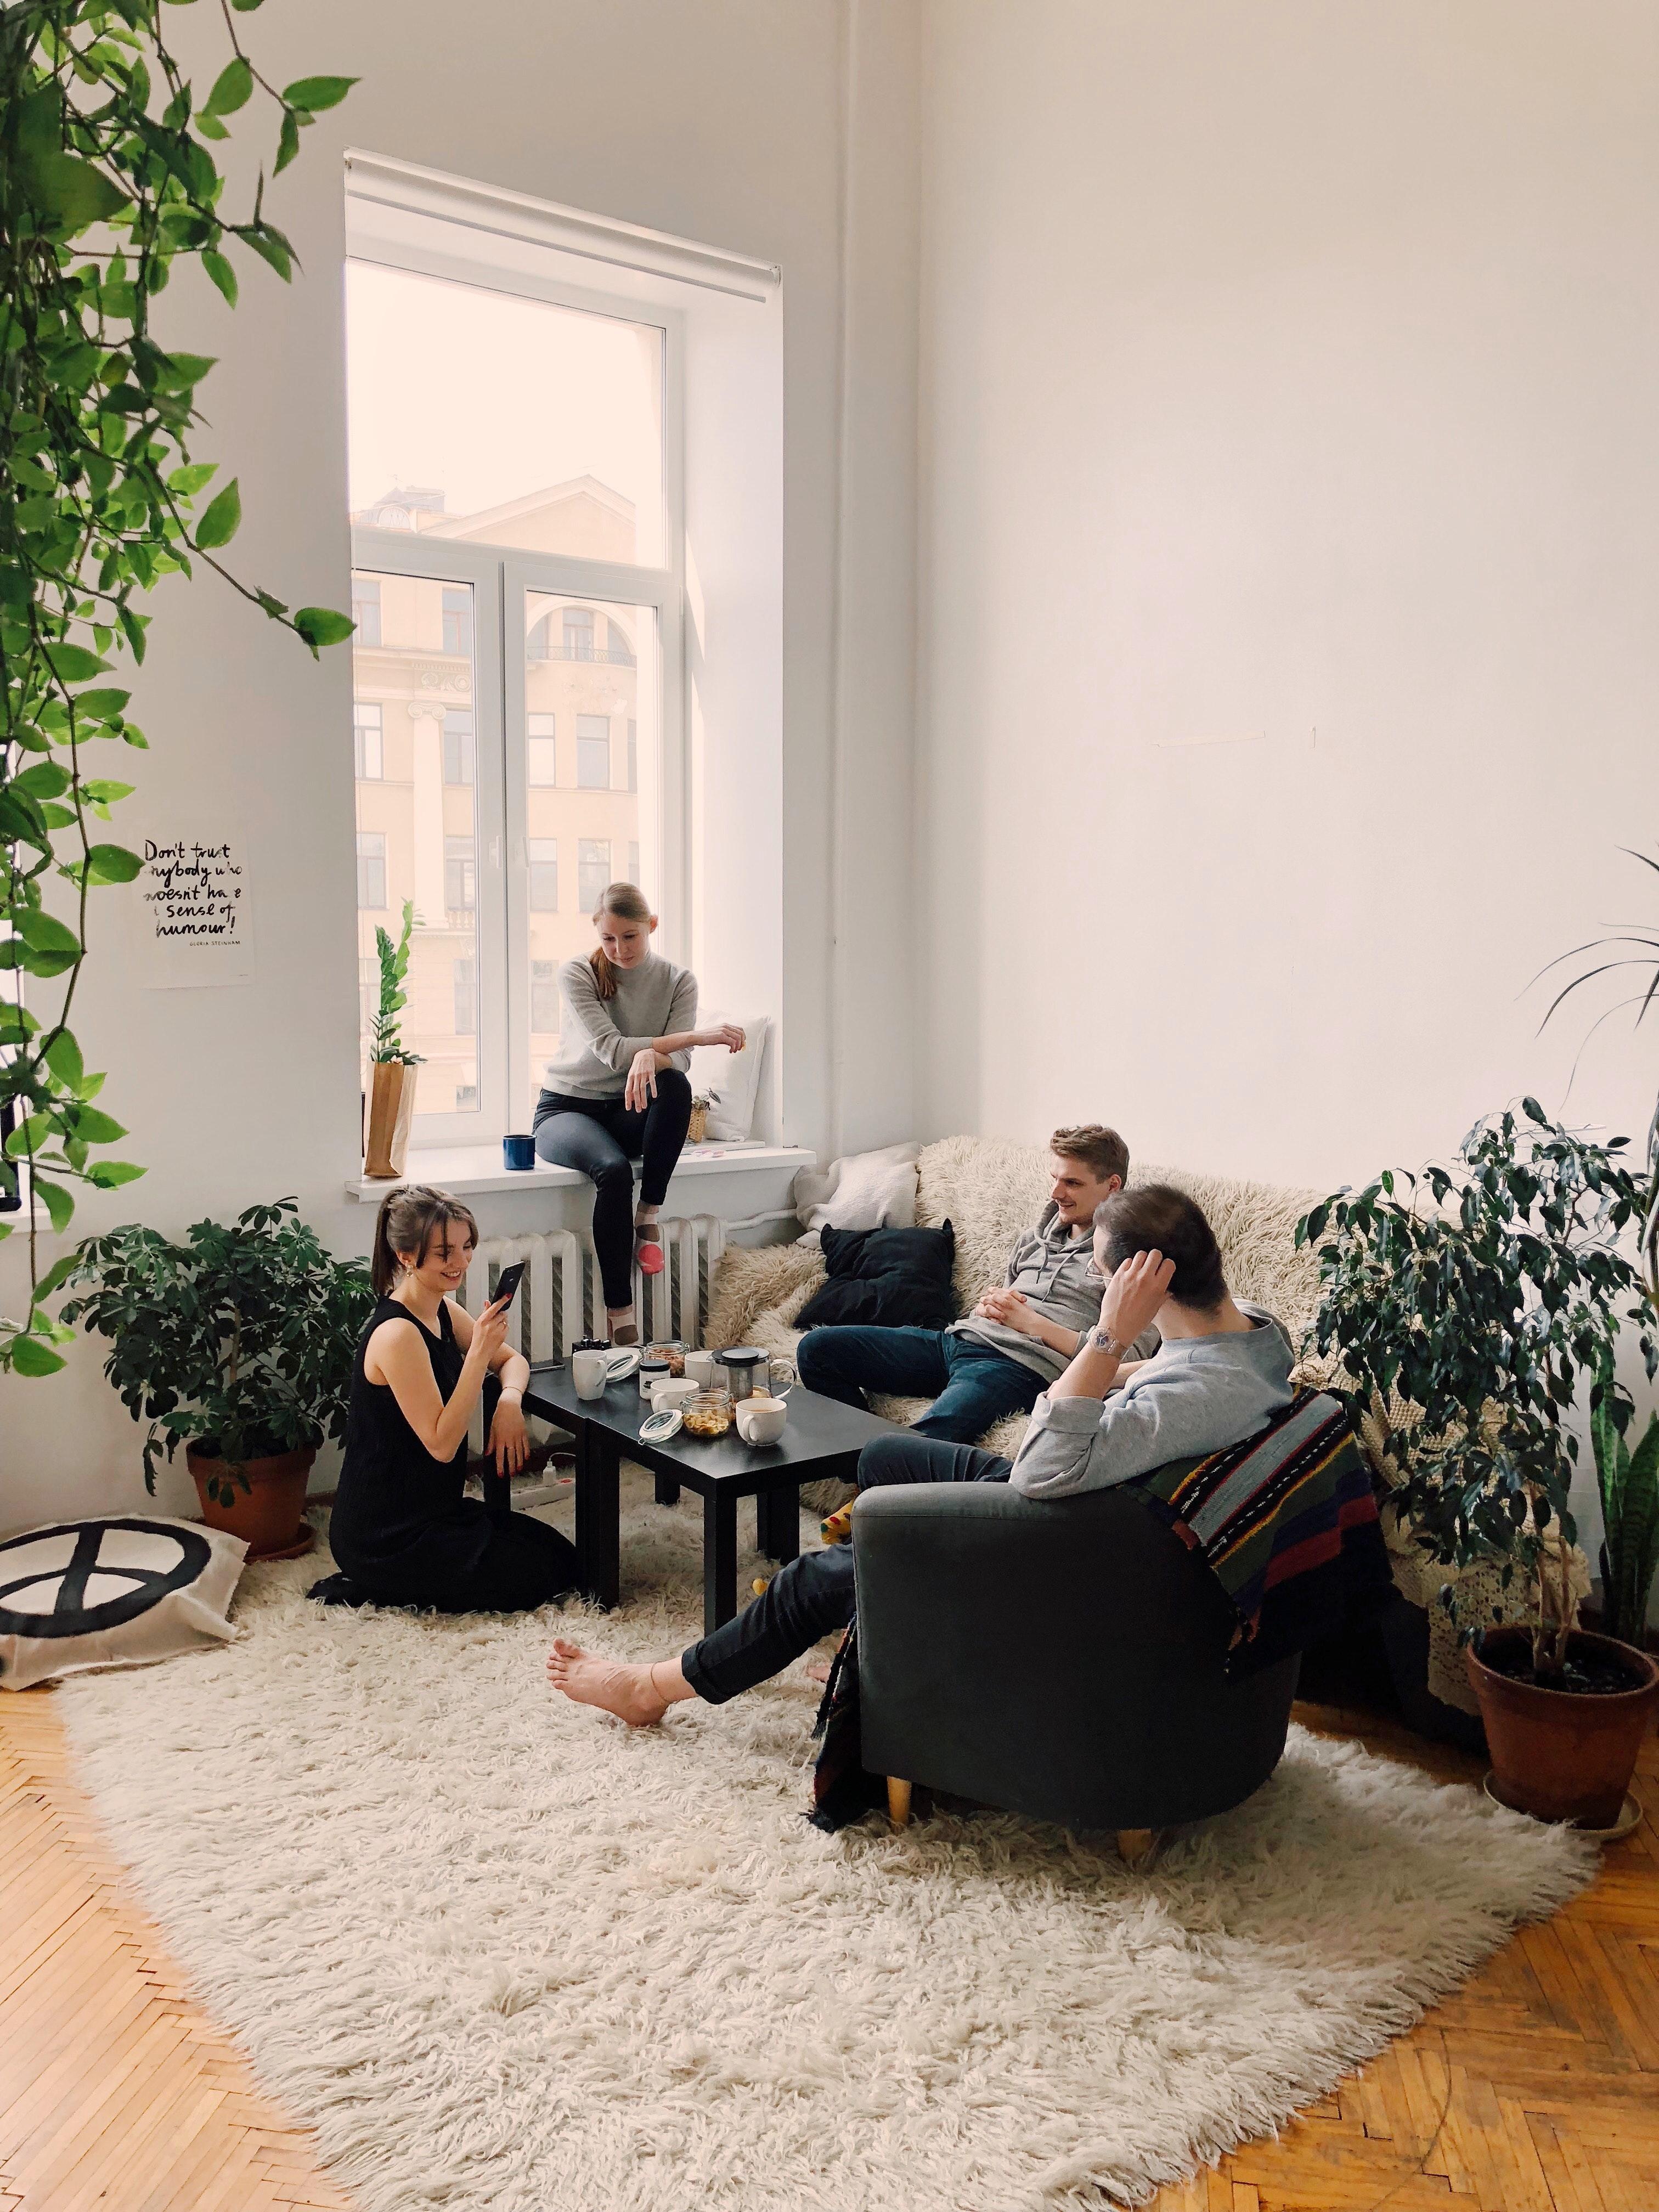 Home Warranties vs Homeowner's Insurance